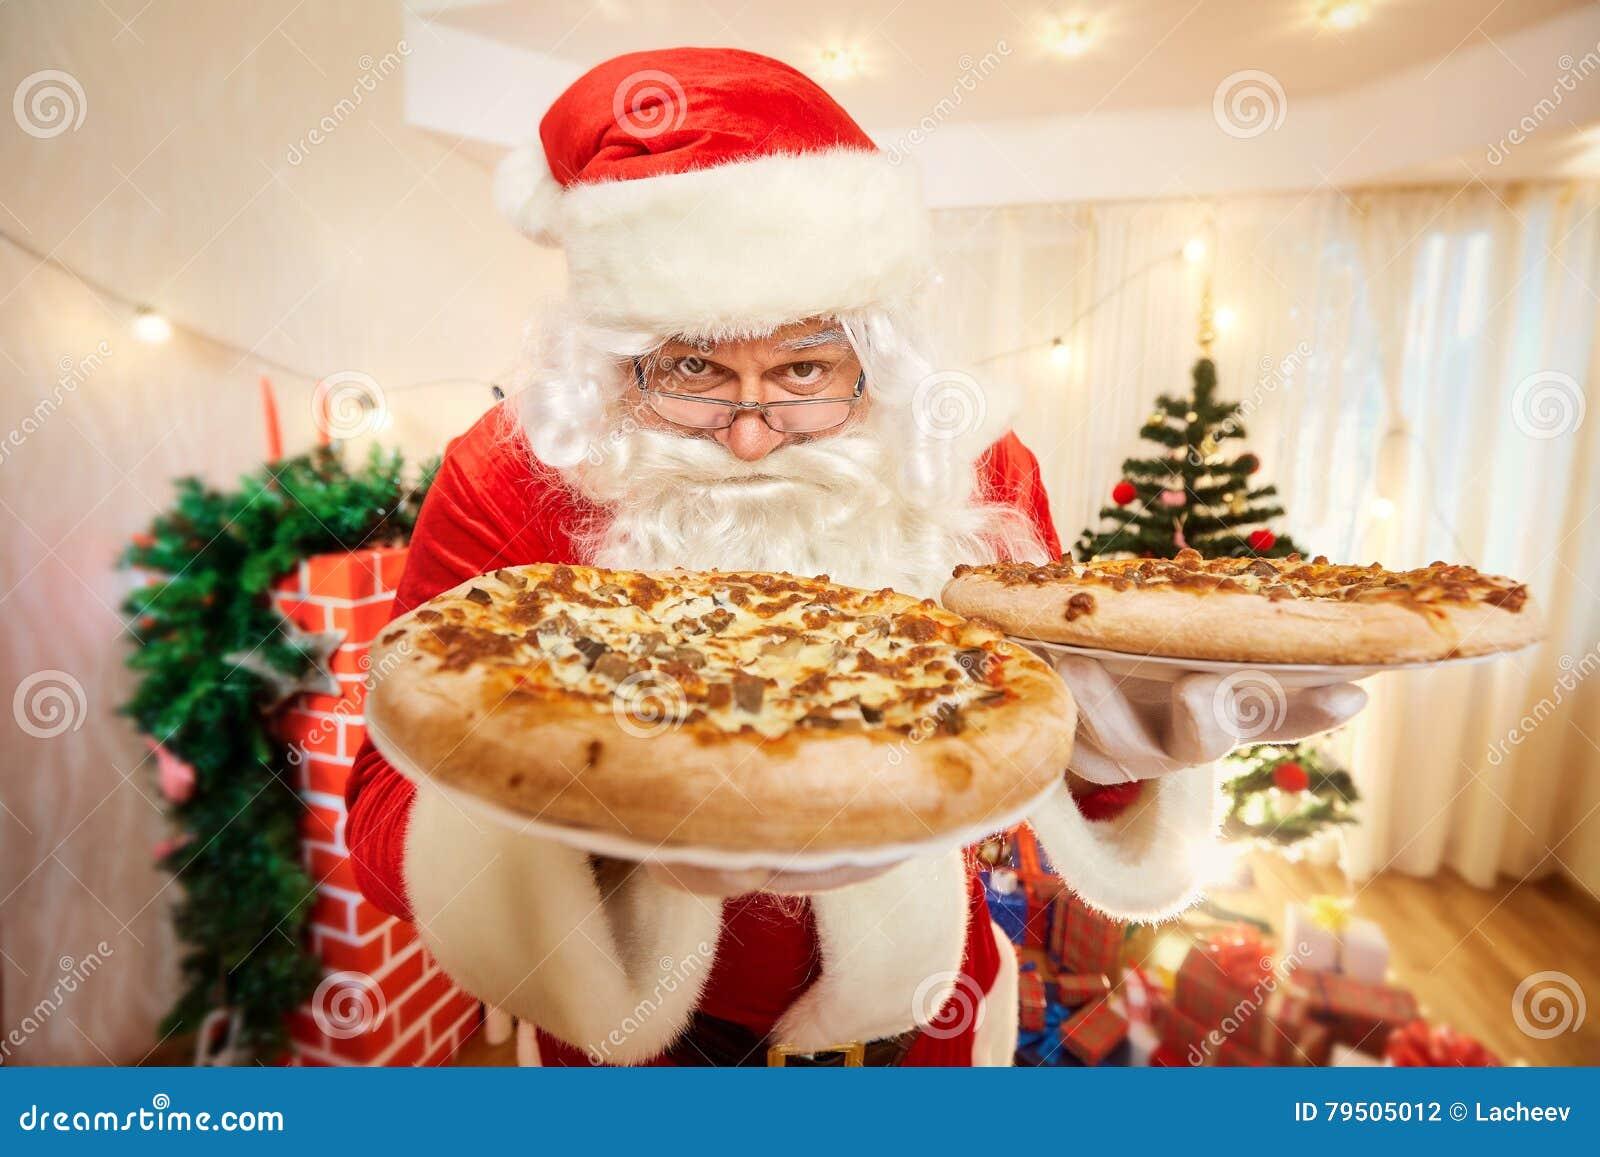 Pizza nas mãos de Santa Claus no Natal, ano novo feliz c